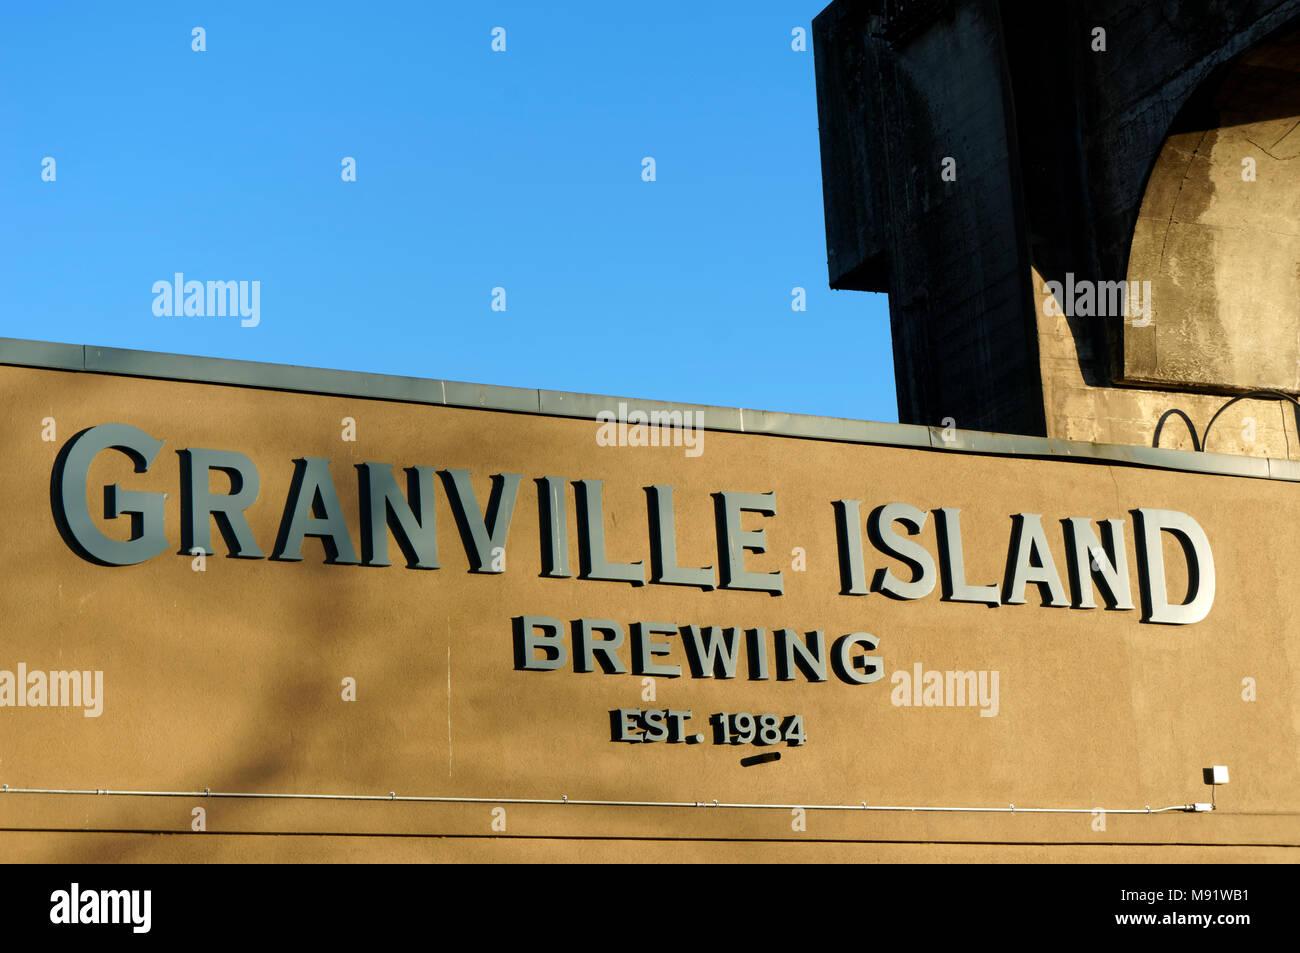 Granville Island Brewing company sign, Granville Island, Vancouver, BC, Canada - Stock Image